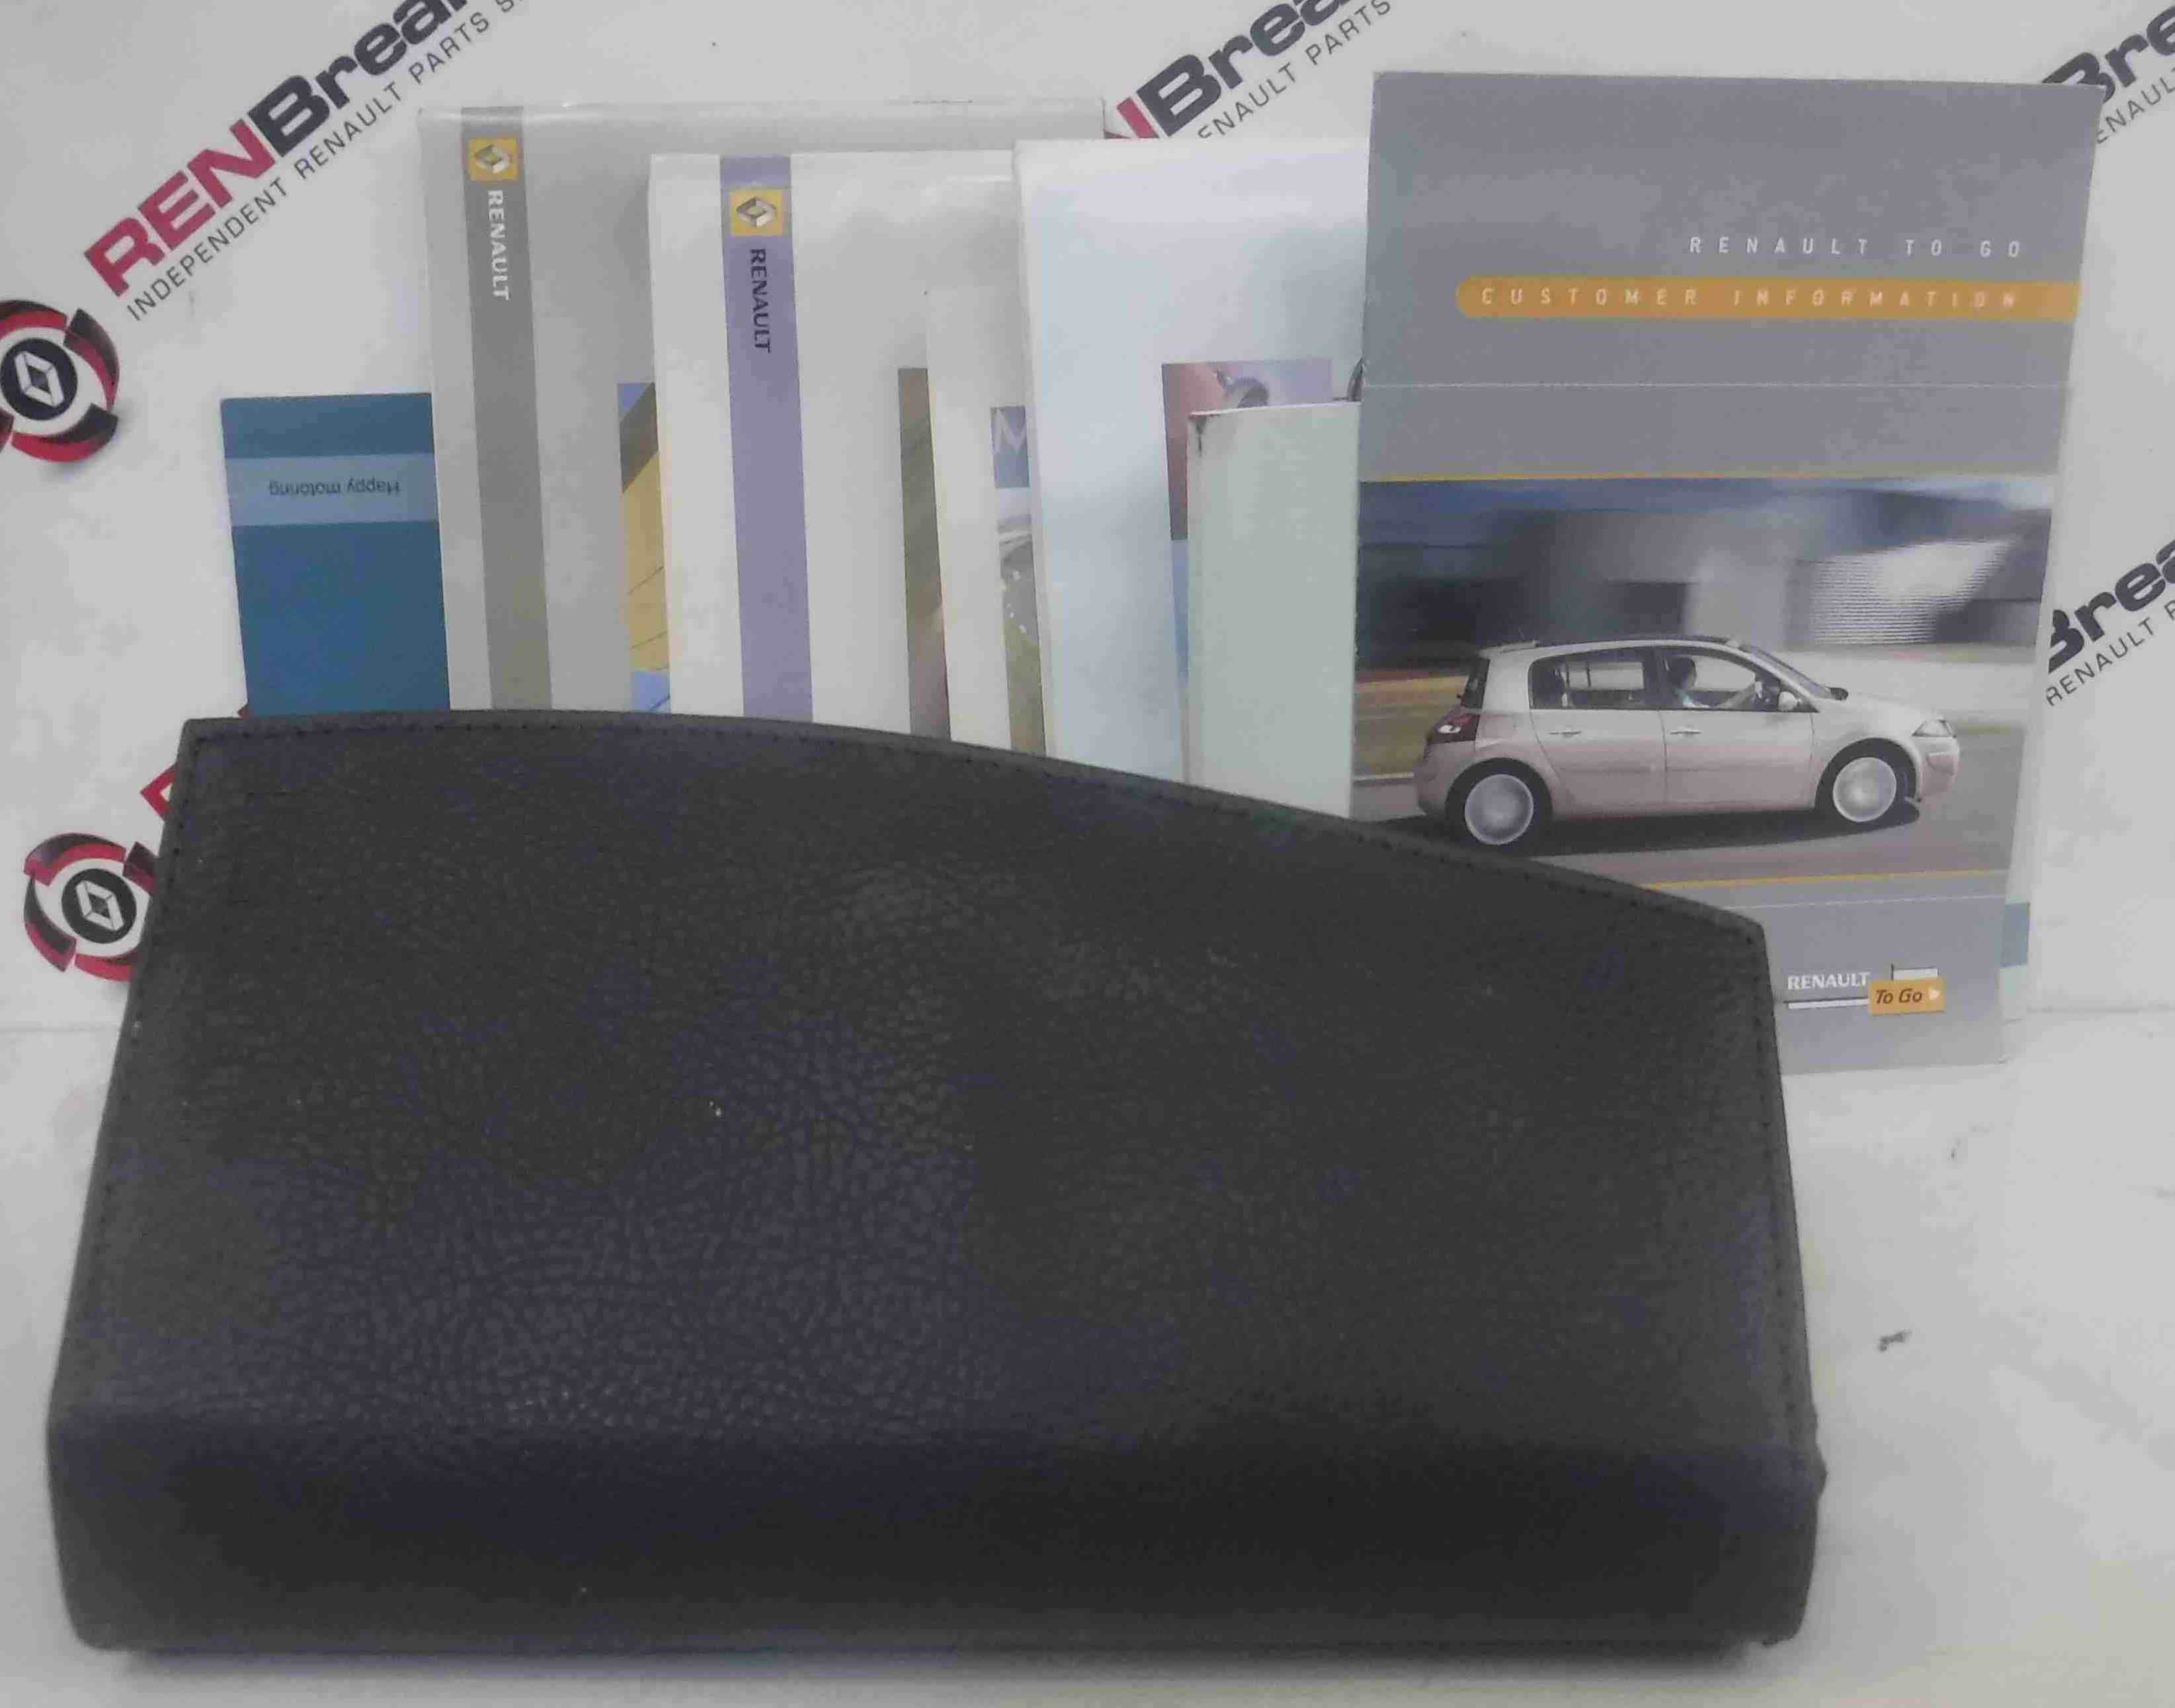 Renault Megane 2006-2008 Handbook Documents + Wallet